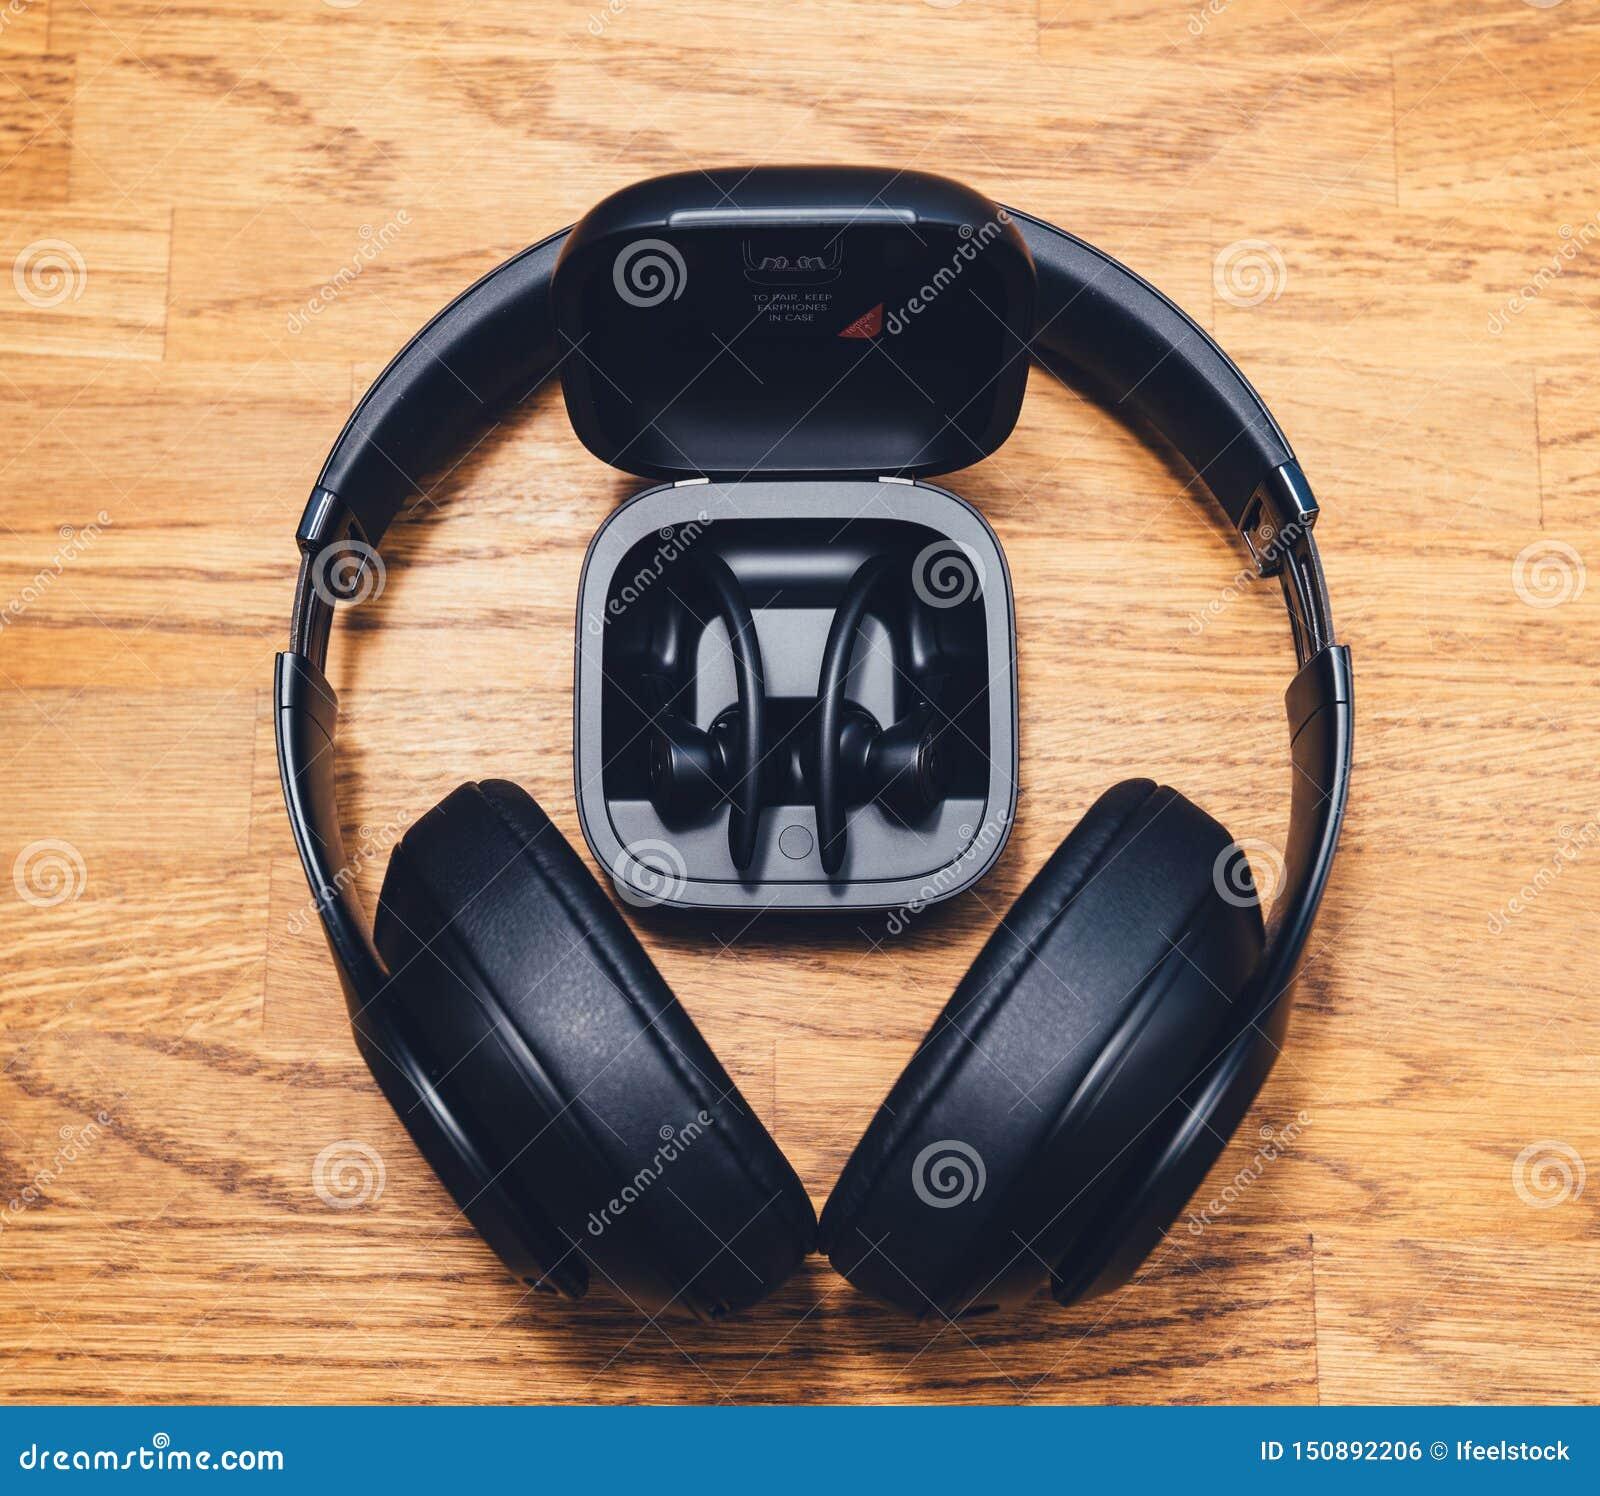 Beats Studio 3 Wireless And Powerbeats Pro Beats On Table Desk Editorial Photo Image Of Wireless Workout 150892206